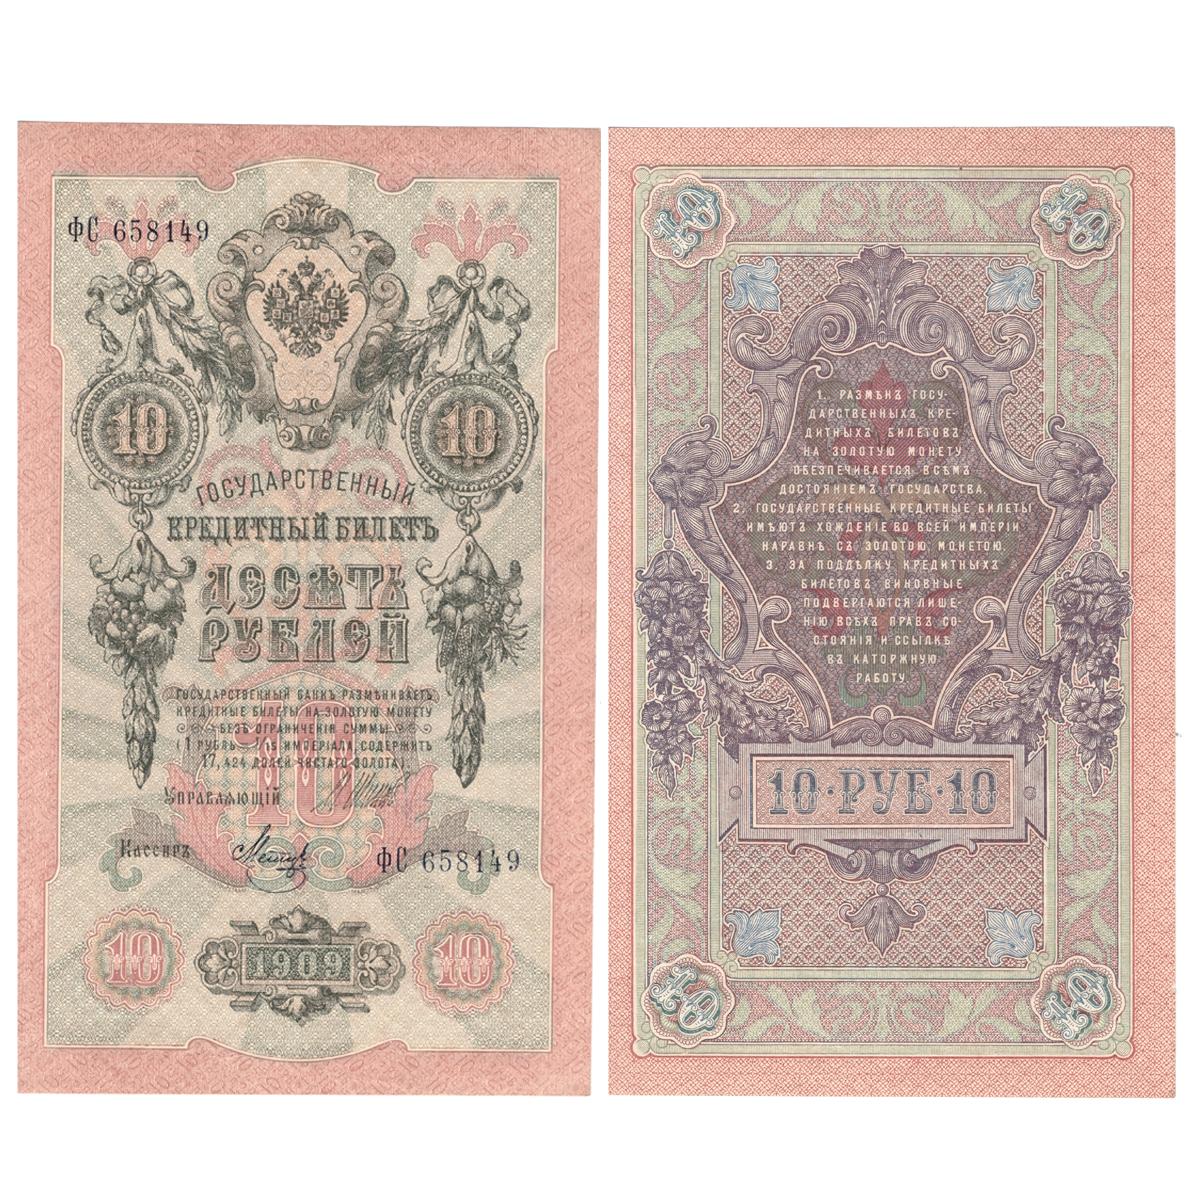 10 рублей 1909 г. Шипов Метц. Серия: -ФС- XF-AU